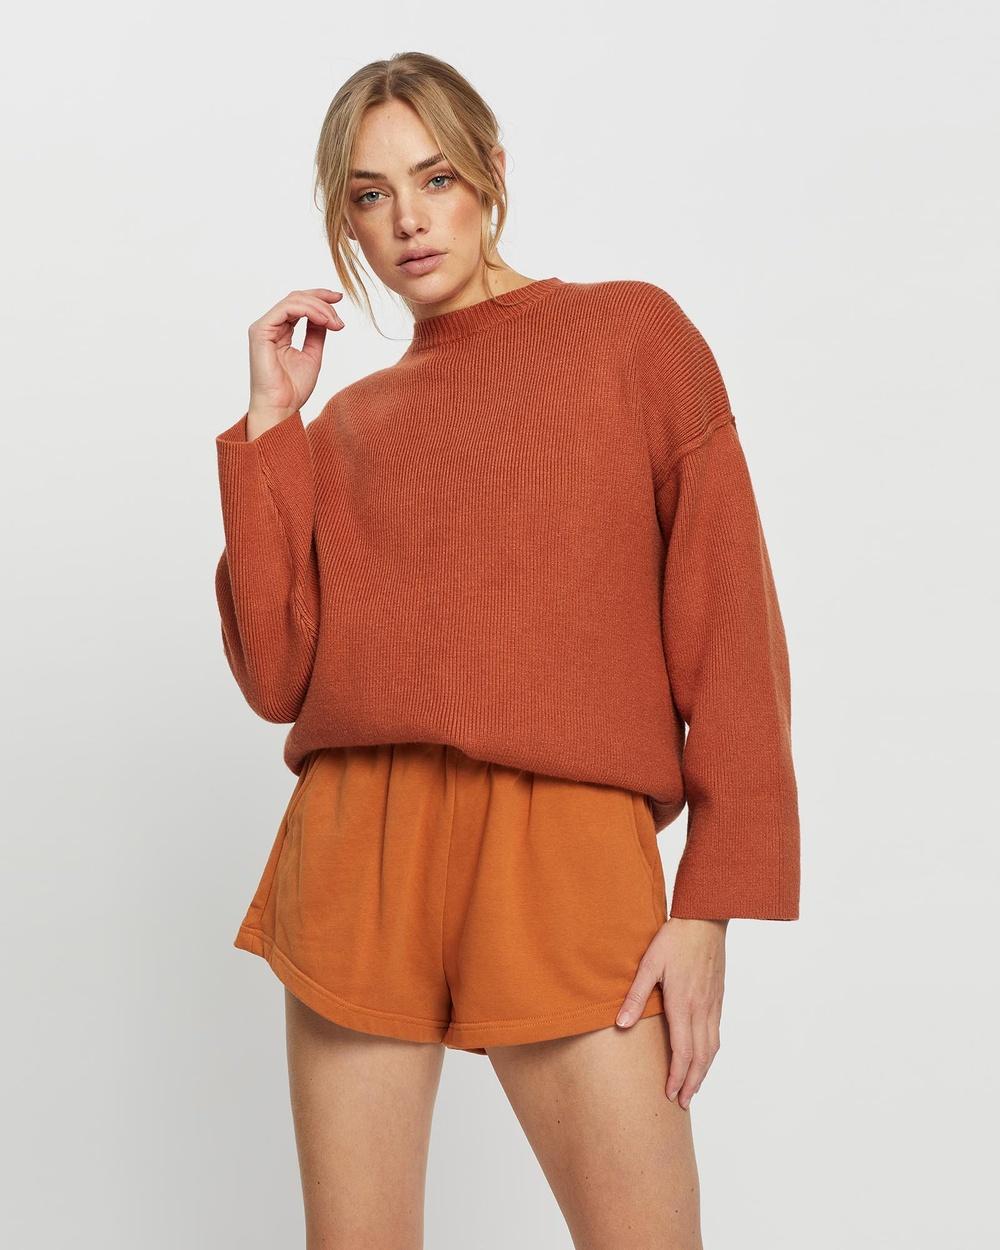 All Fenix Finley Knit Hoodies Rust